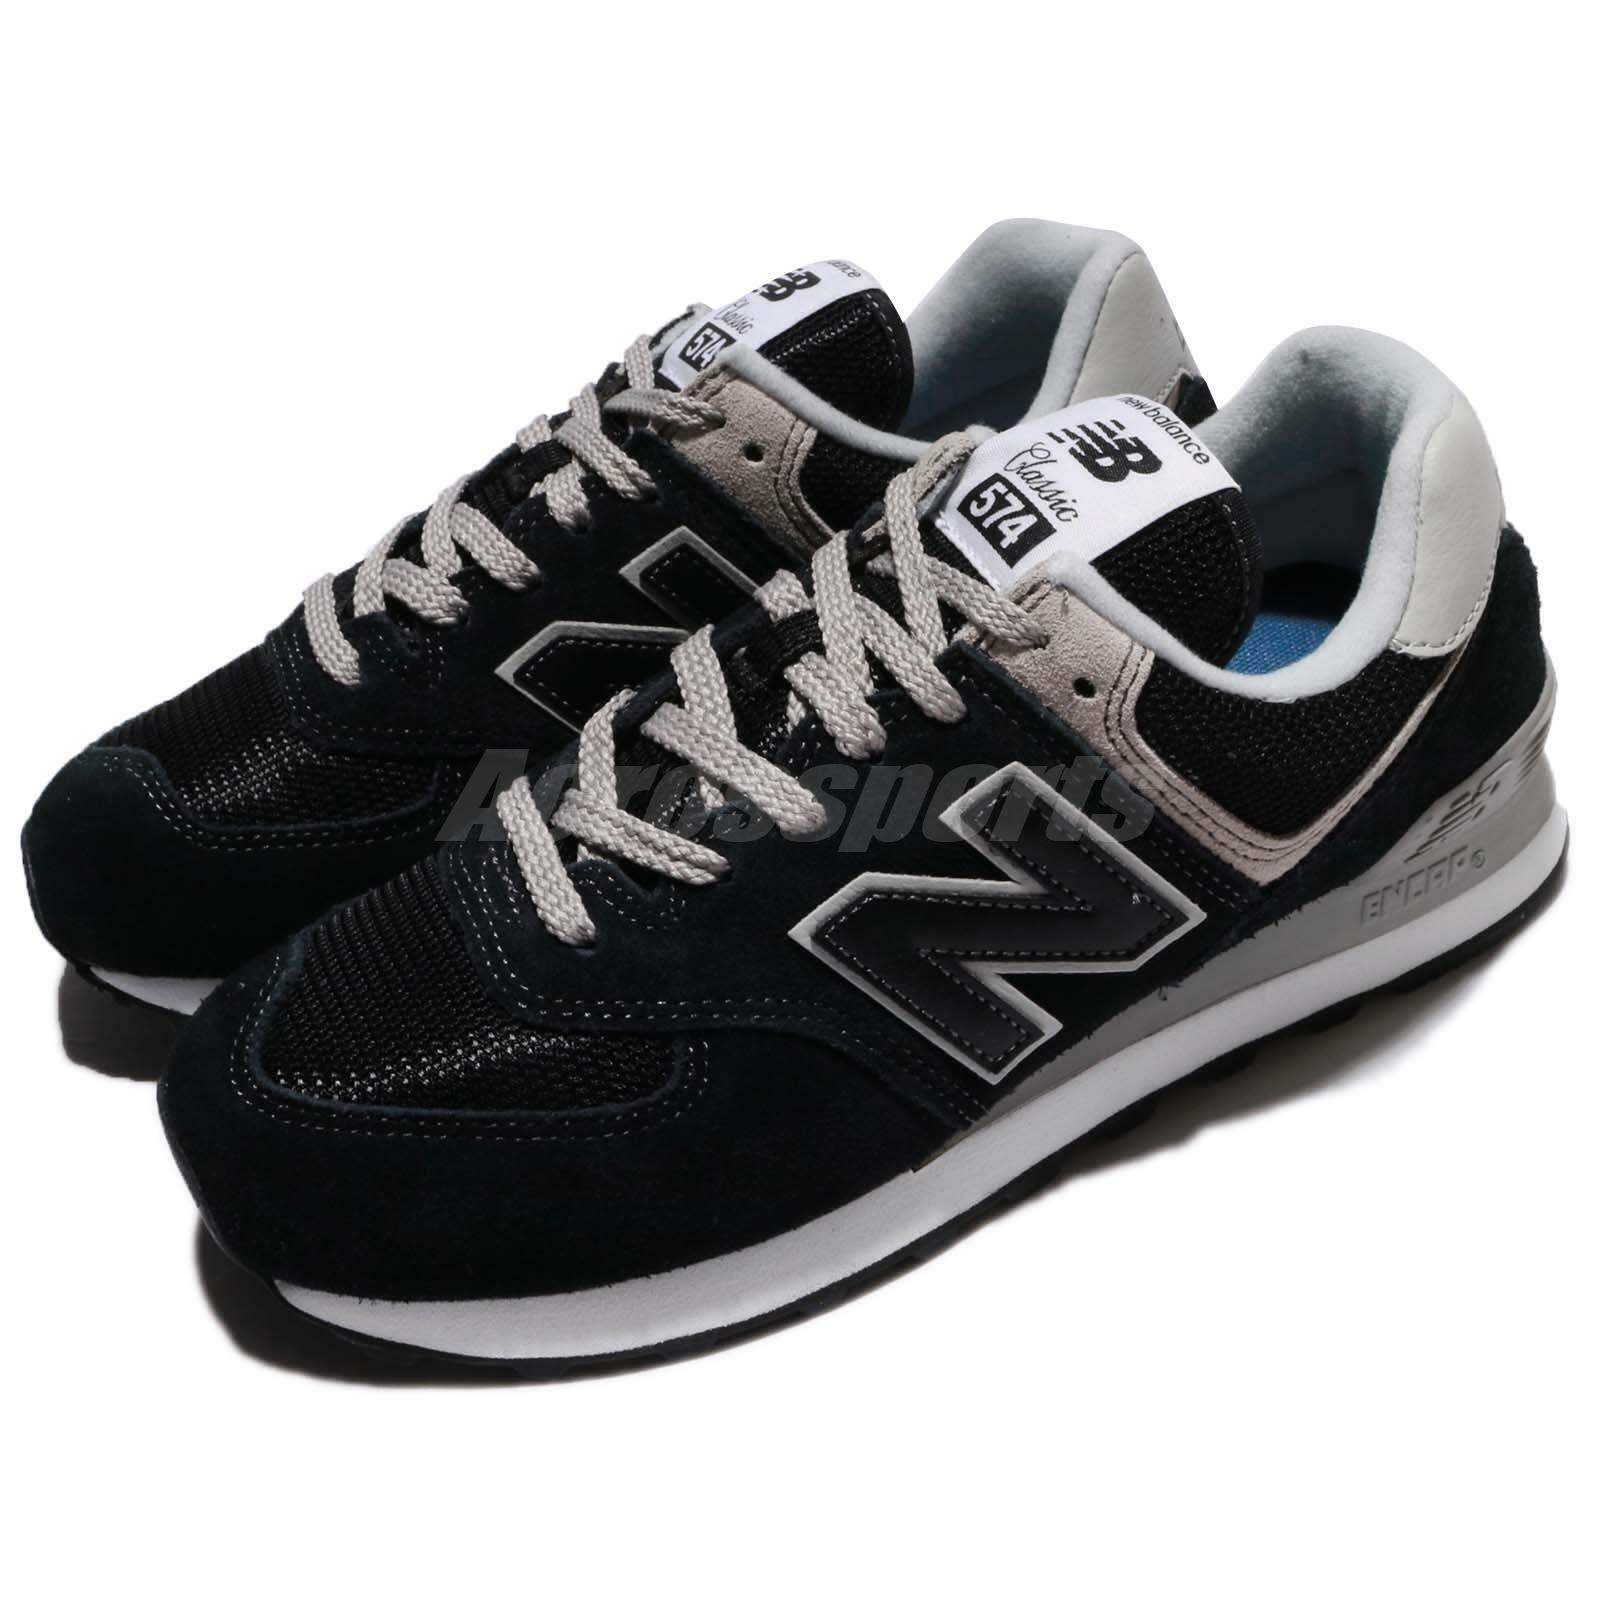 New Balance ML574EGK D 574 Running Suede Noir Gris Hommes Running 574 Chaussures Baskets ML574EGKD 7b3034